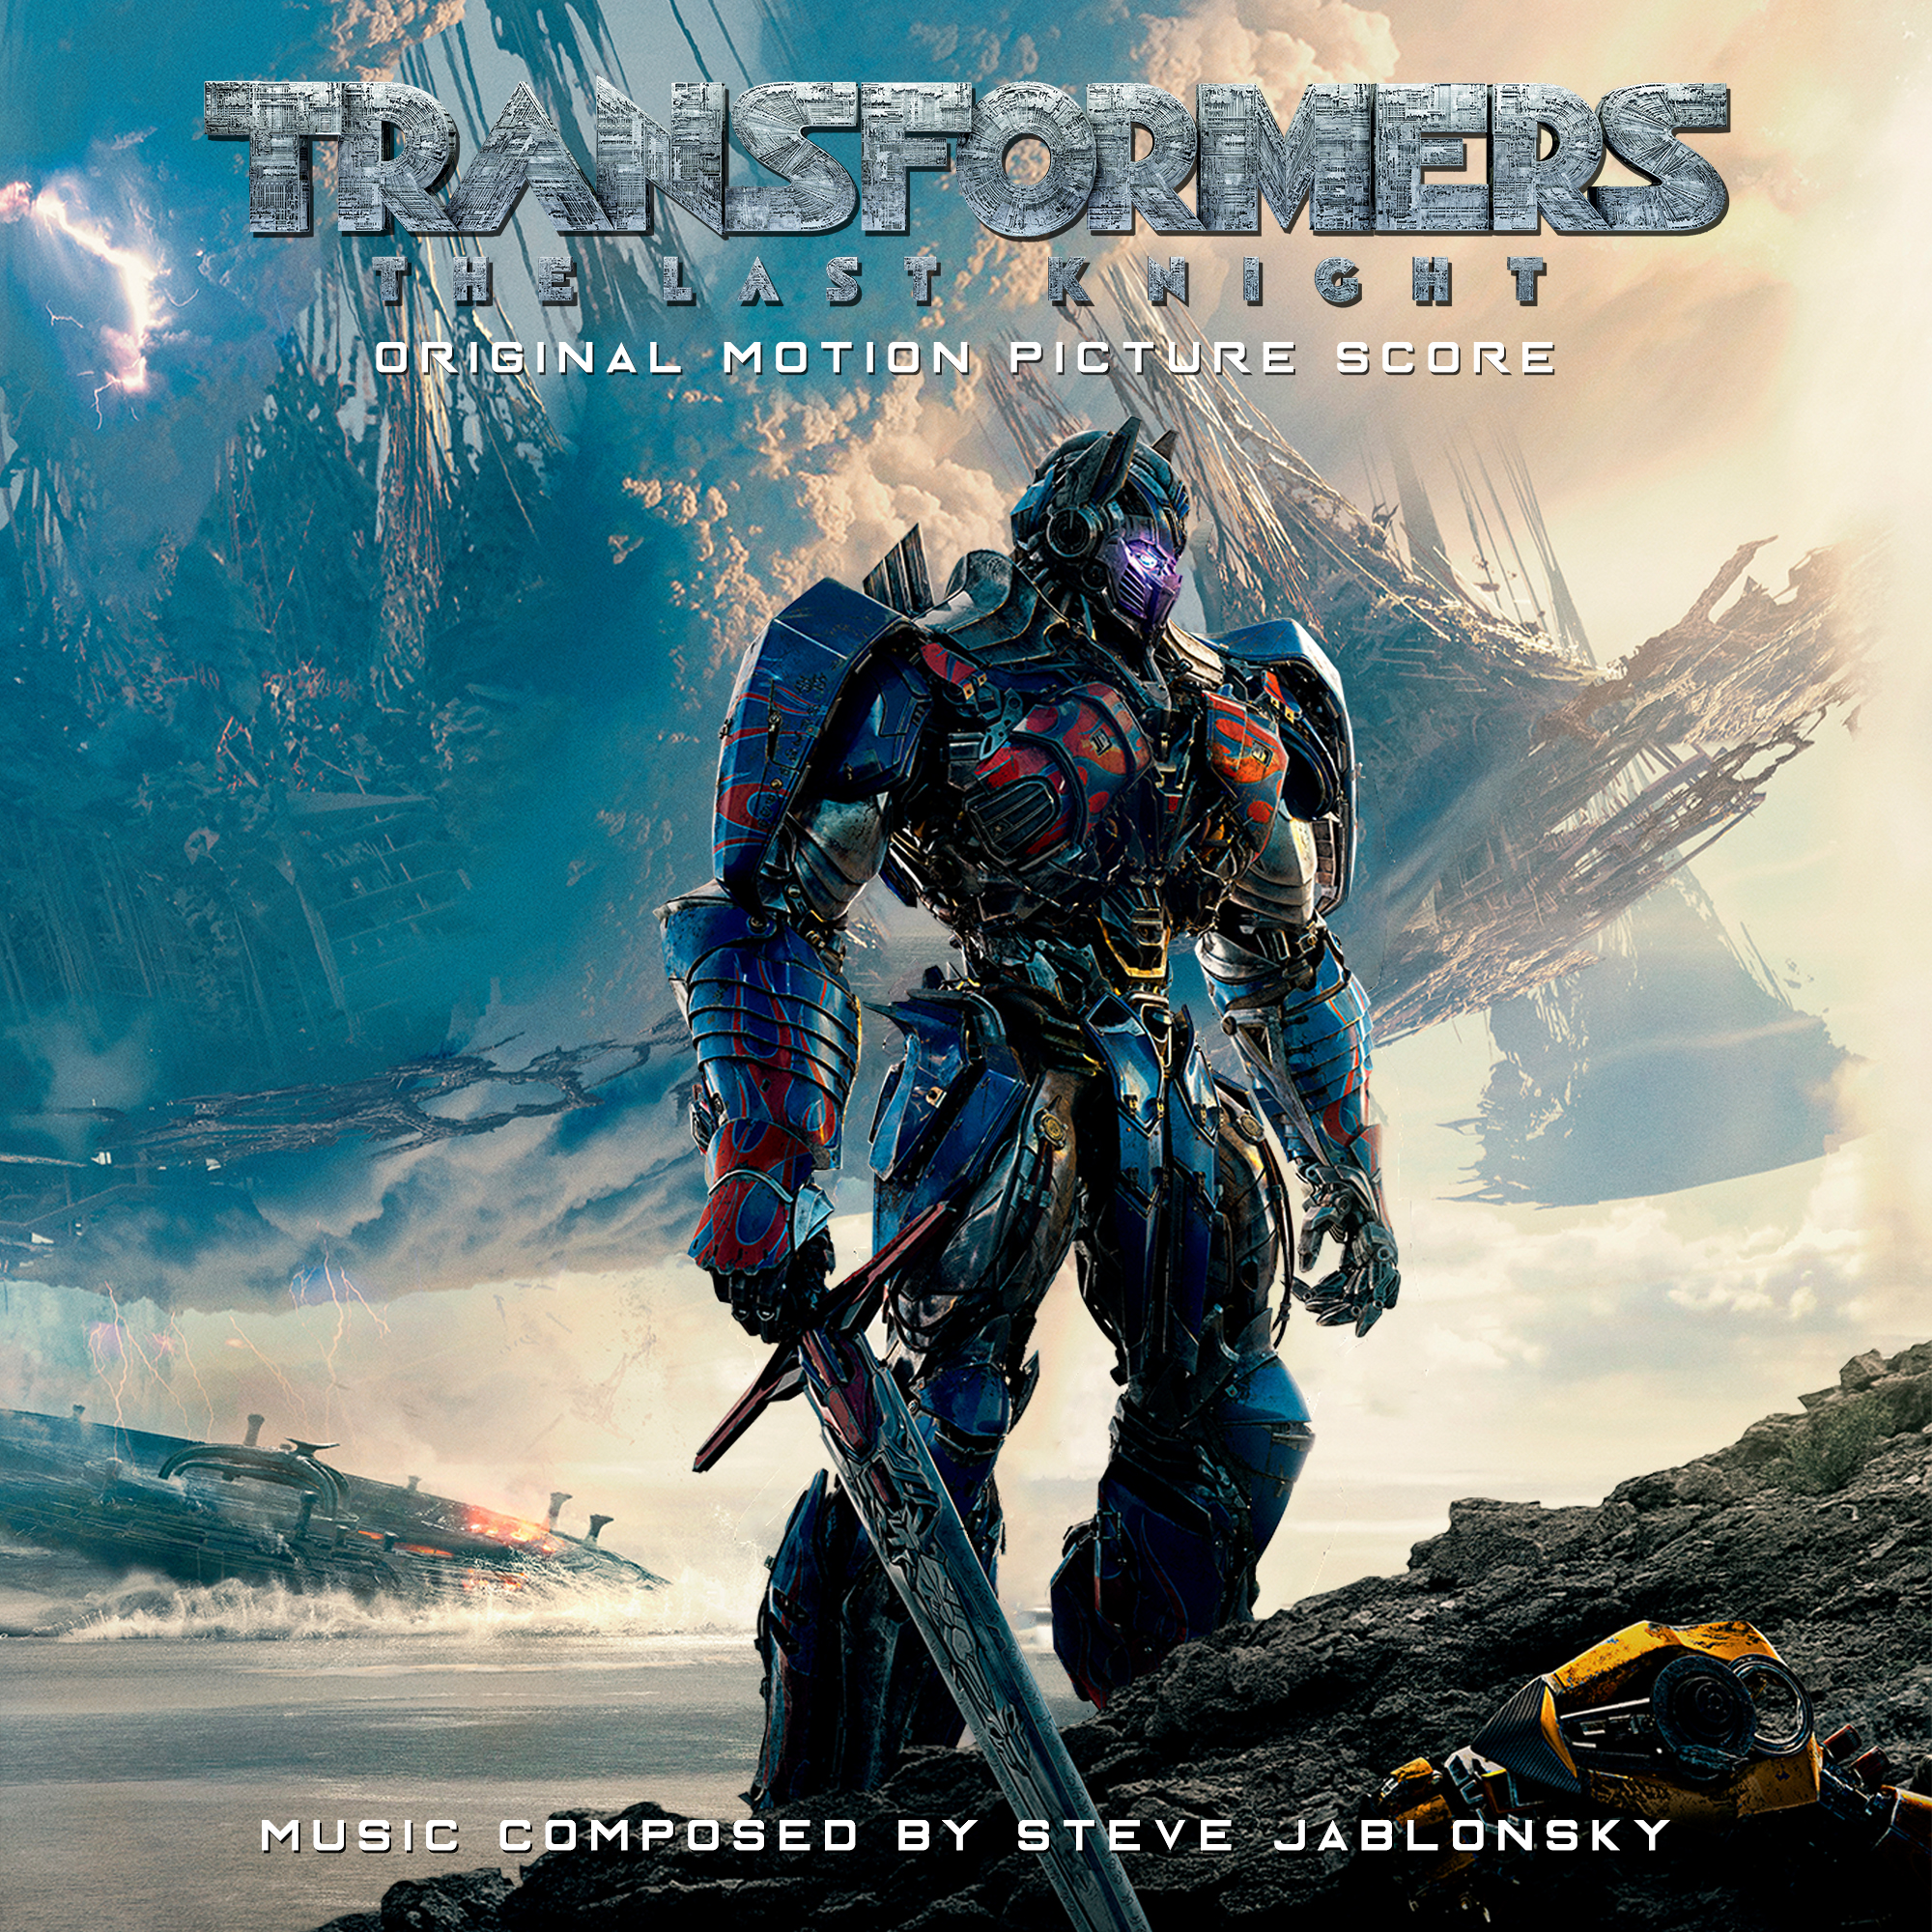 transformers soundtrack download